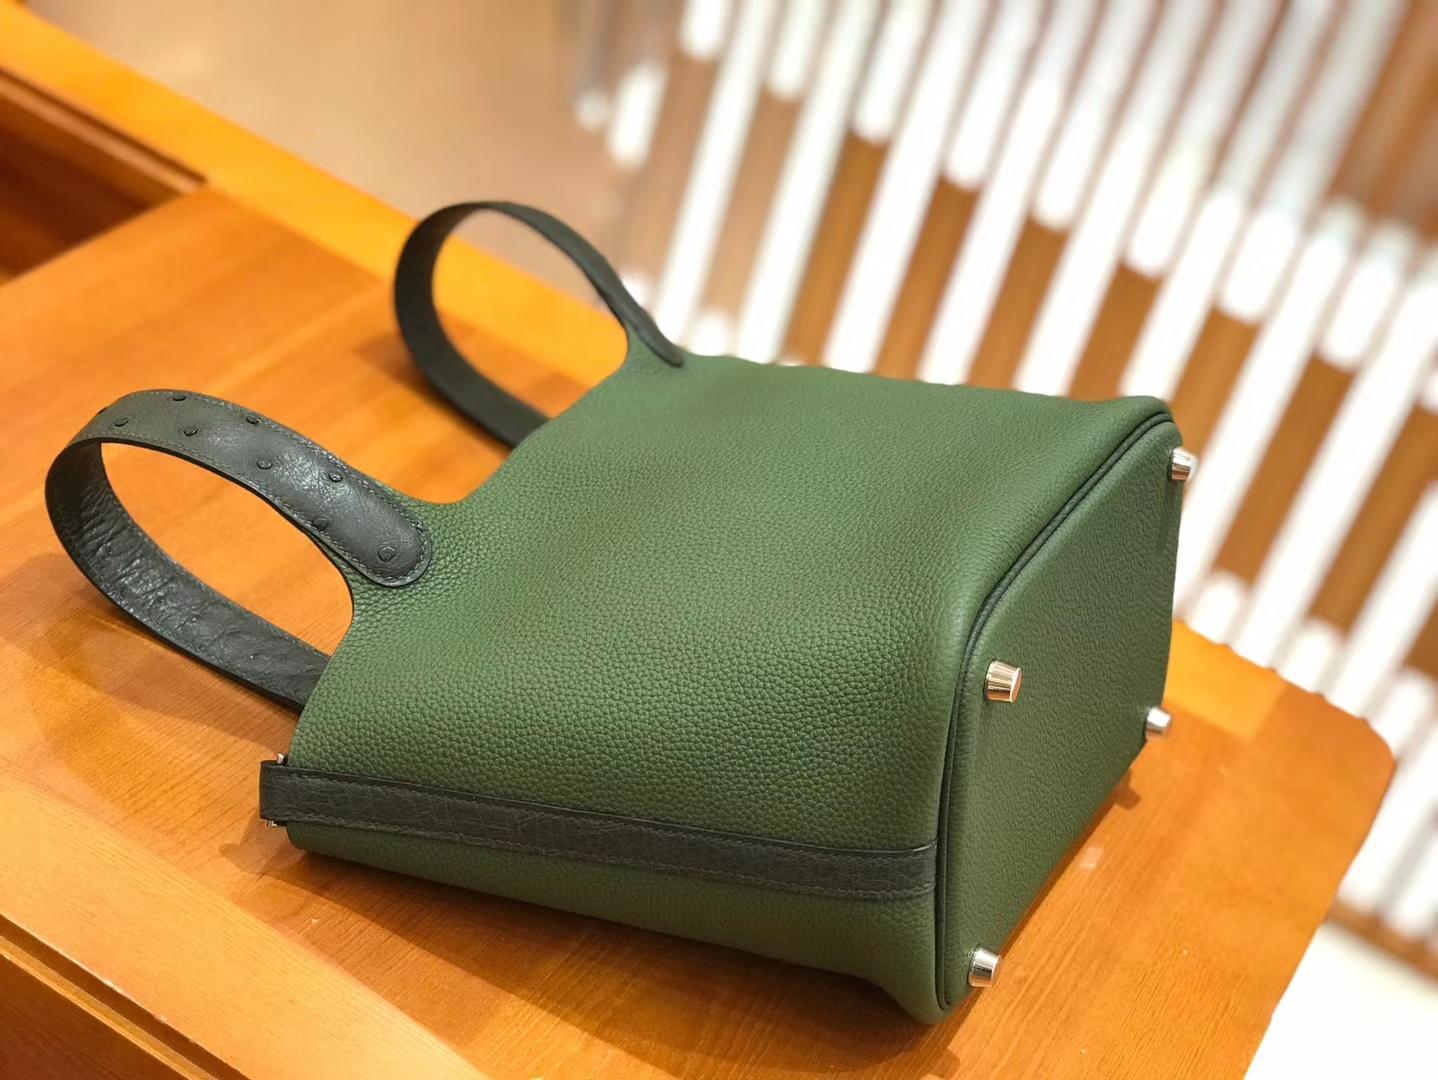 Hermès(爱马仕)Piction 18cm 丛林绿 银扣 鸵鸟皮拼小牛皮 全手工缝制